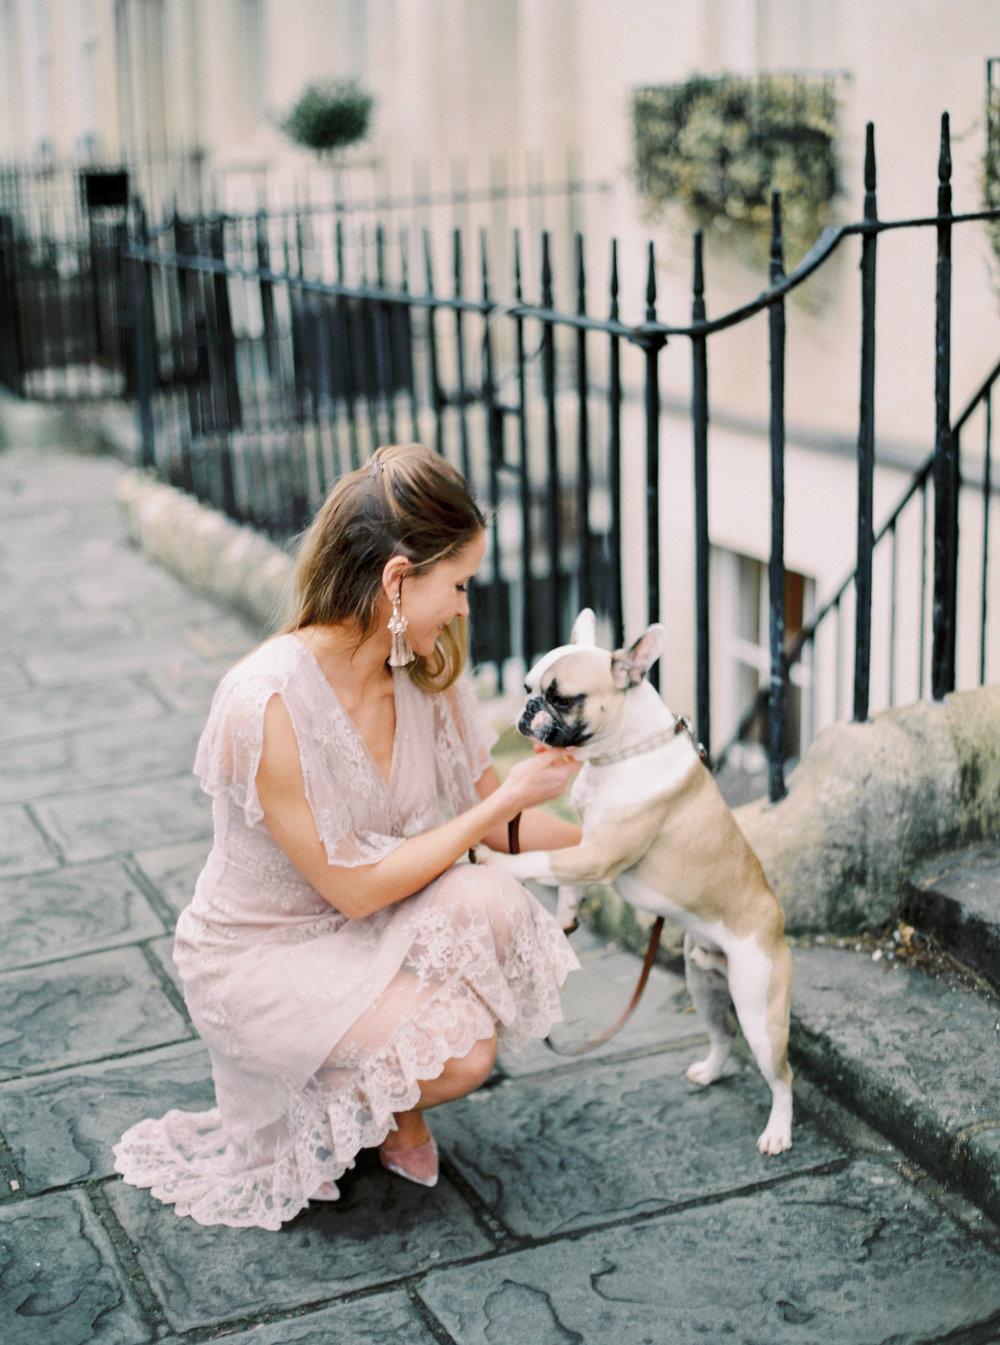 Luxury Wedding Planner UK | Our Chic & Romantic Engagement Shoot in Bath | Katie Julia Photography - 24.JPG